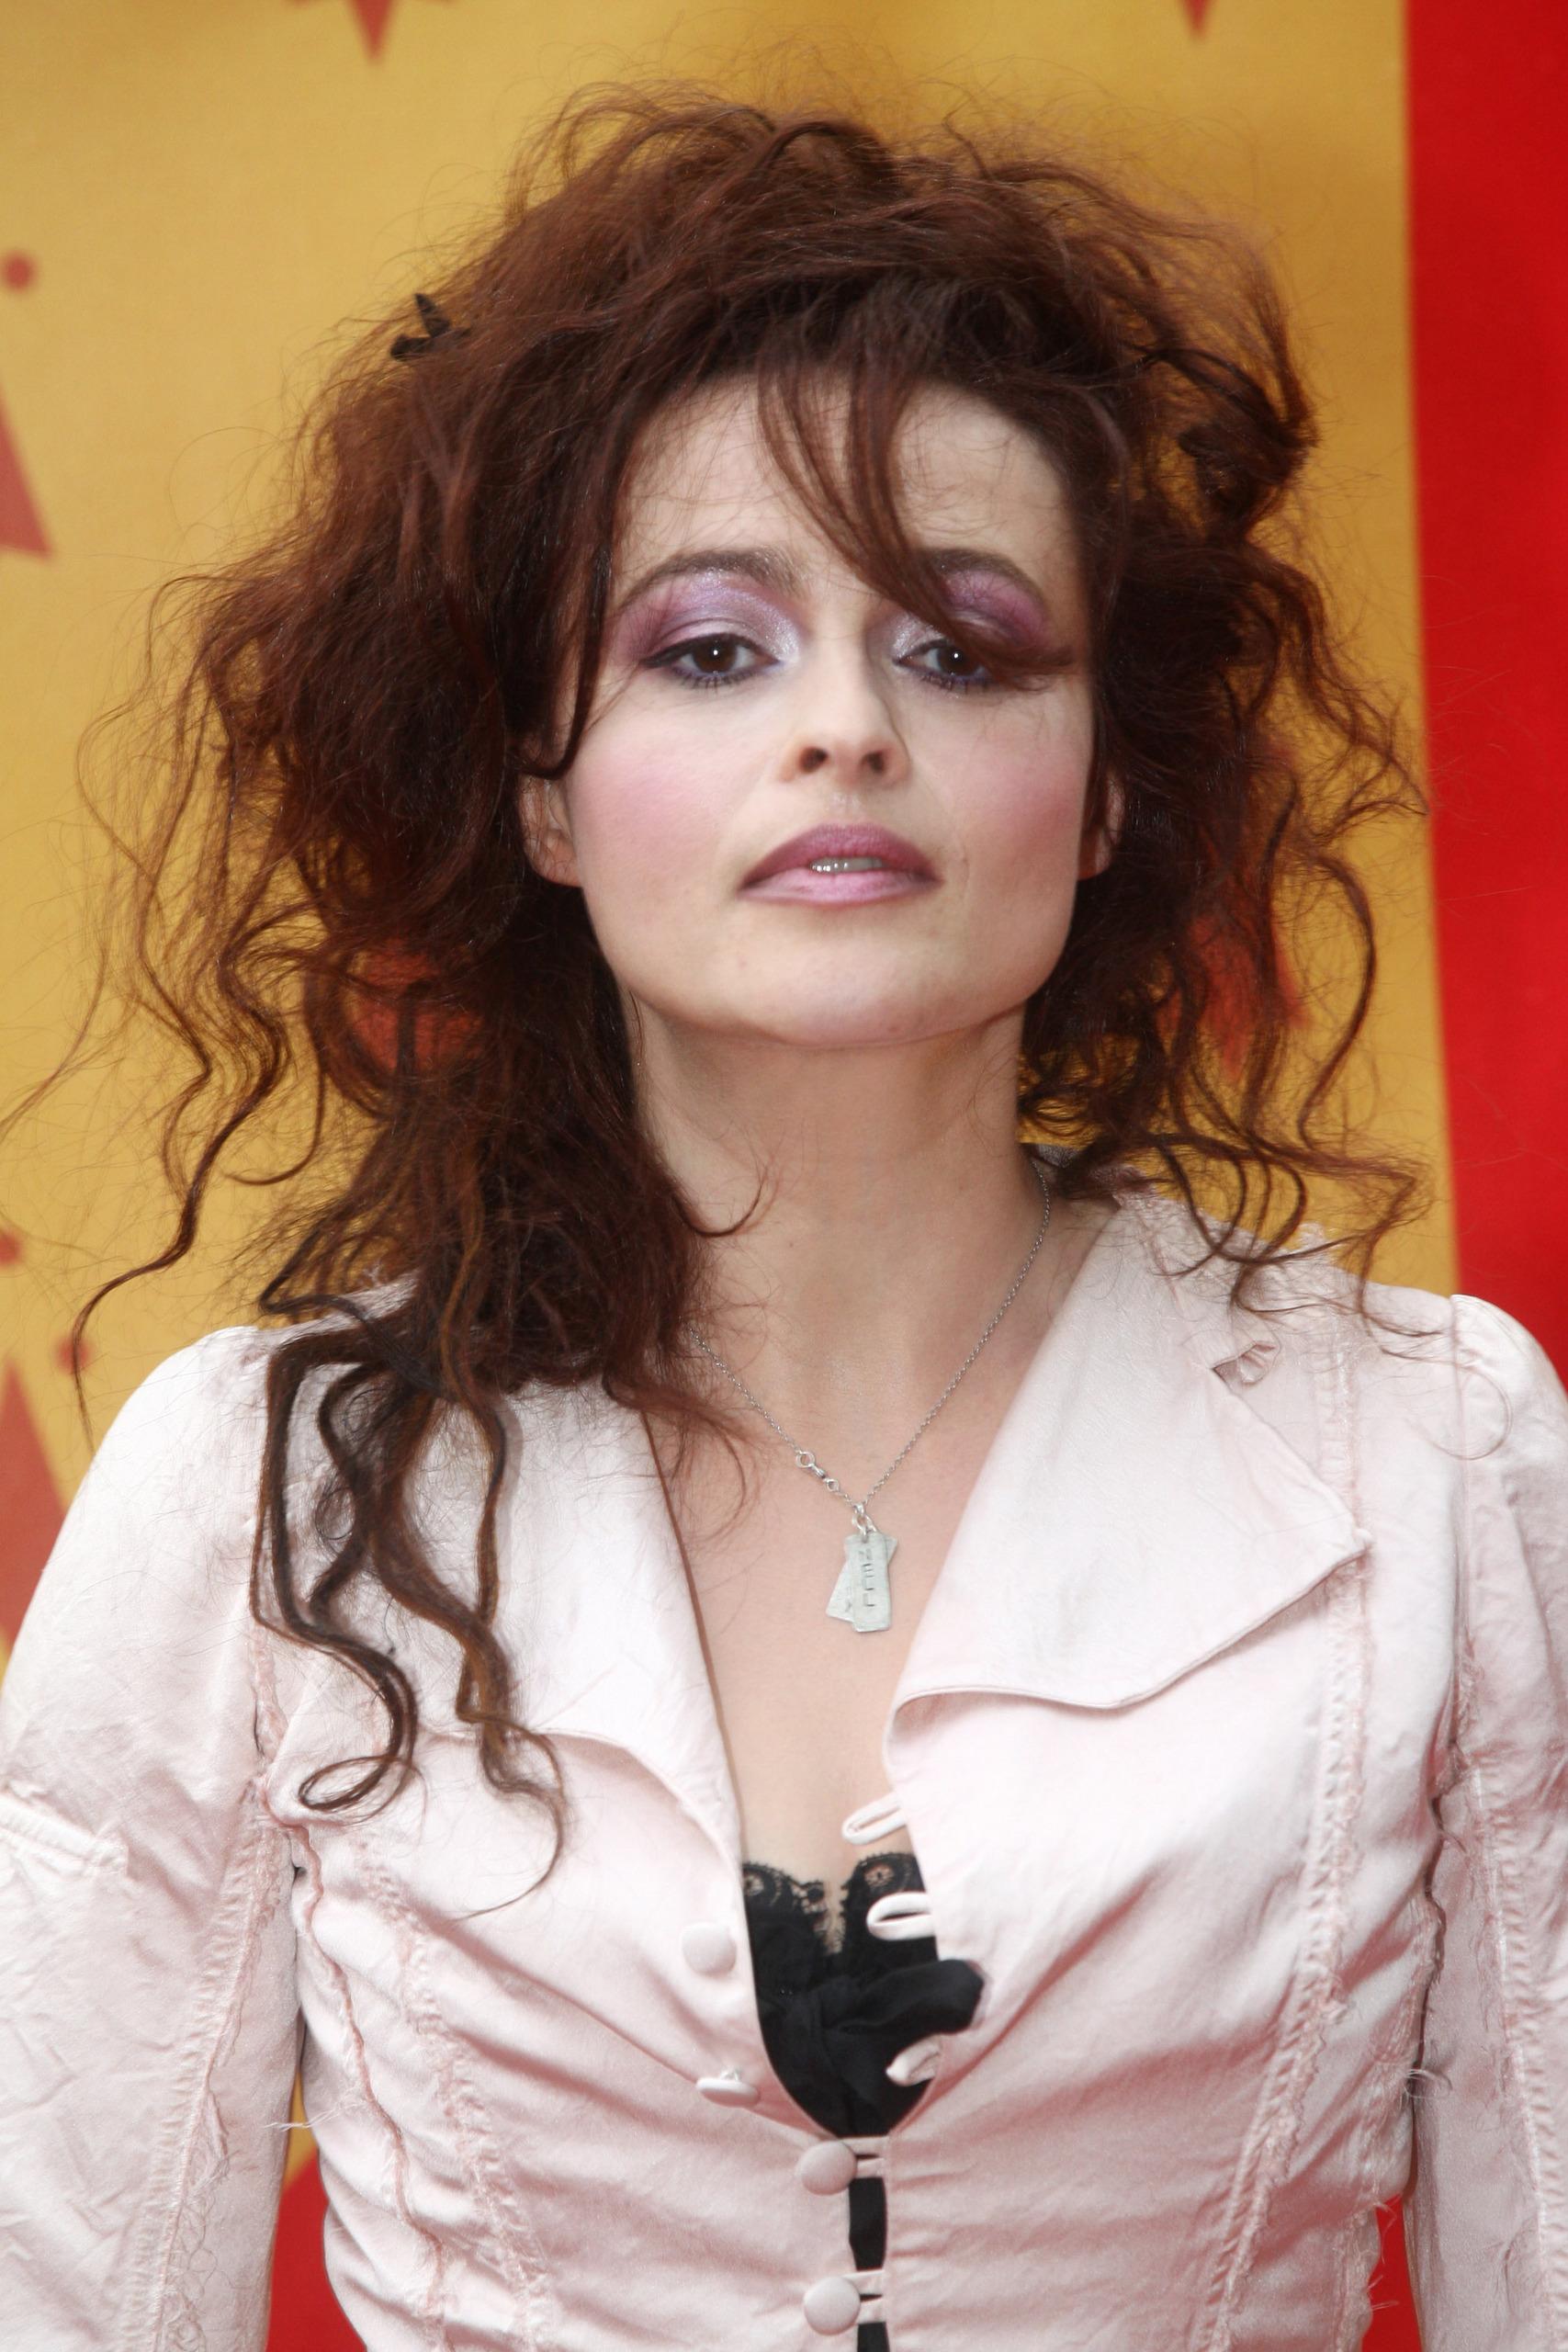 Helena Bonham Carter - Helena Bonham Carter Photo (7034931) - Fanpop Helena Bonham Carter